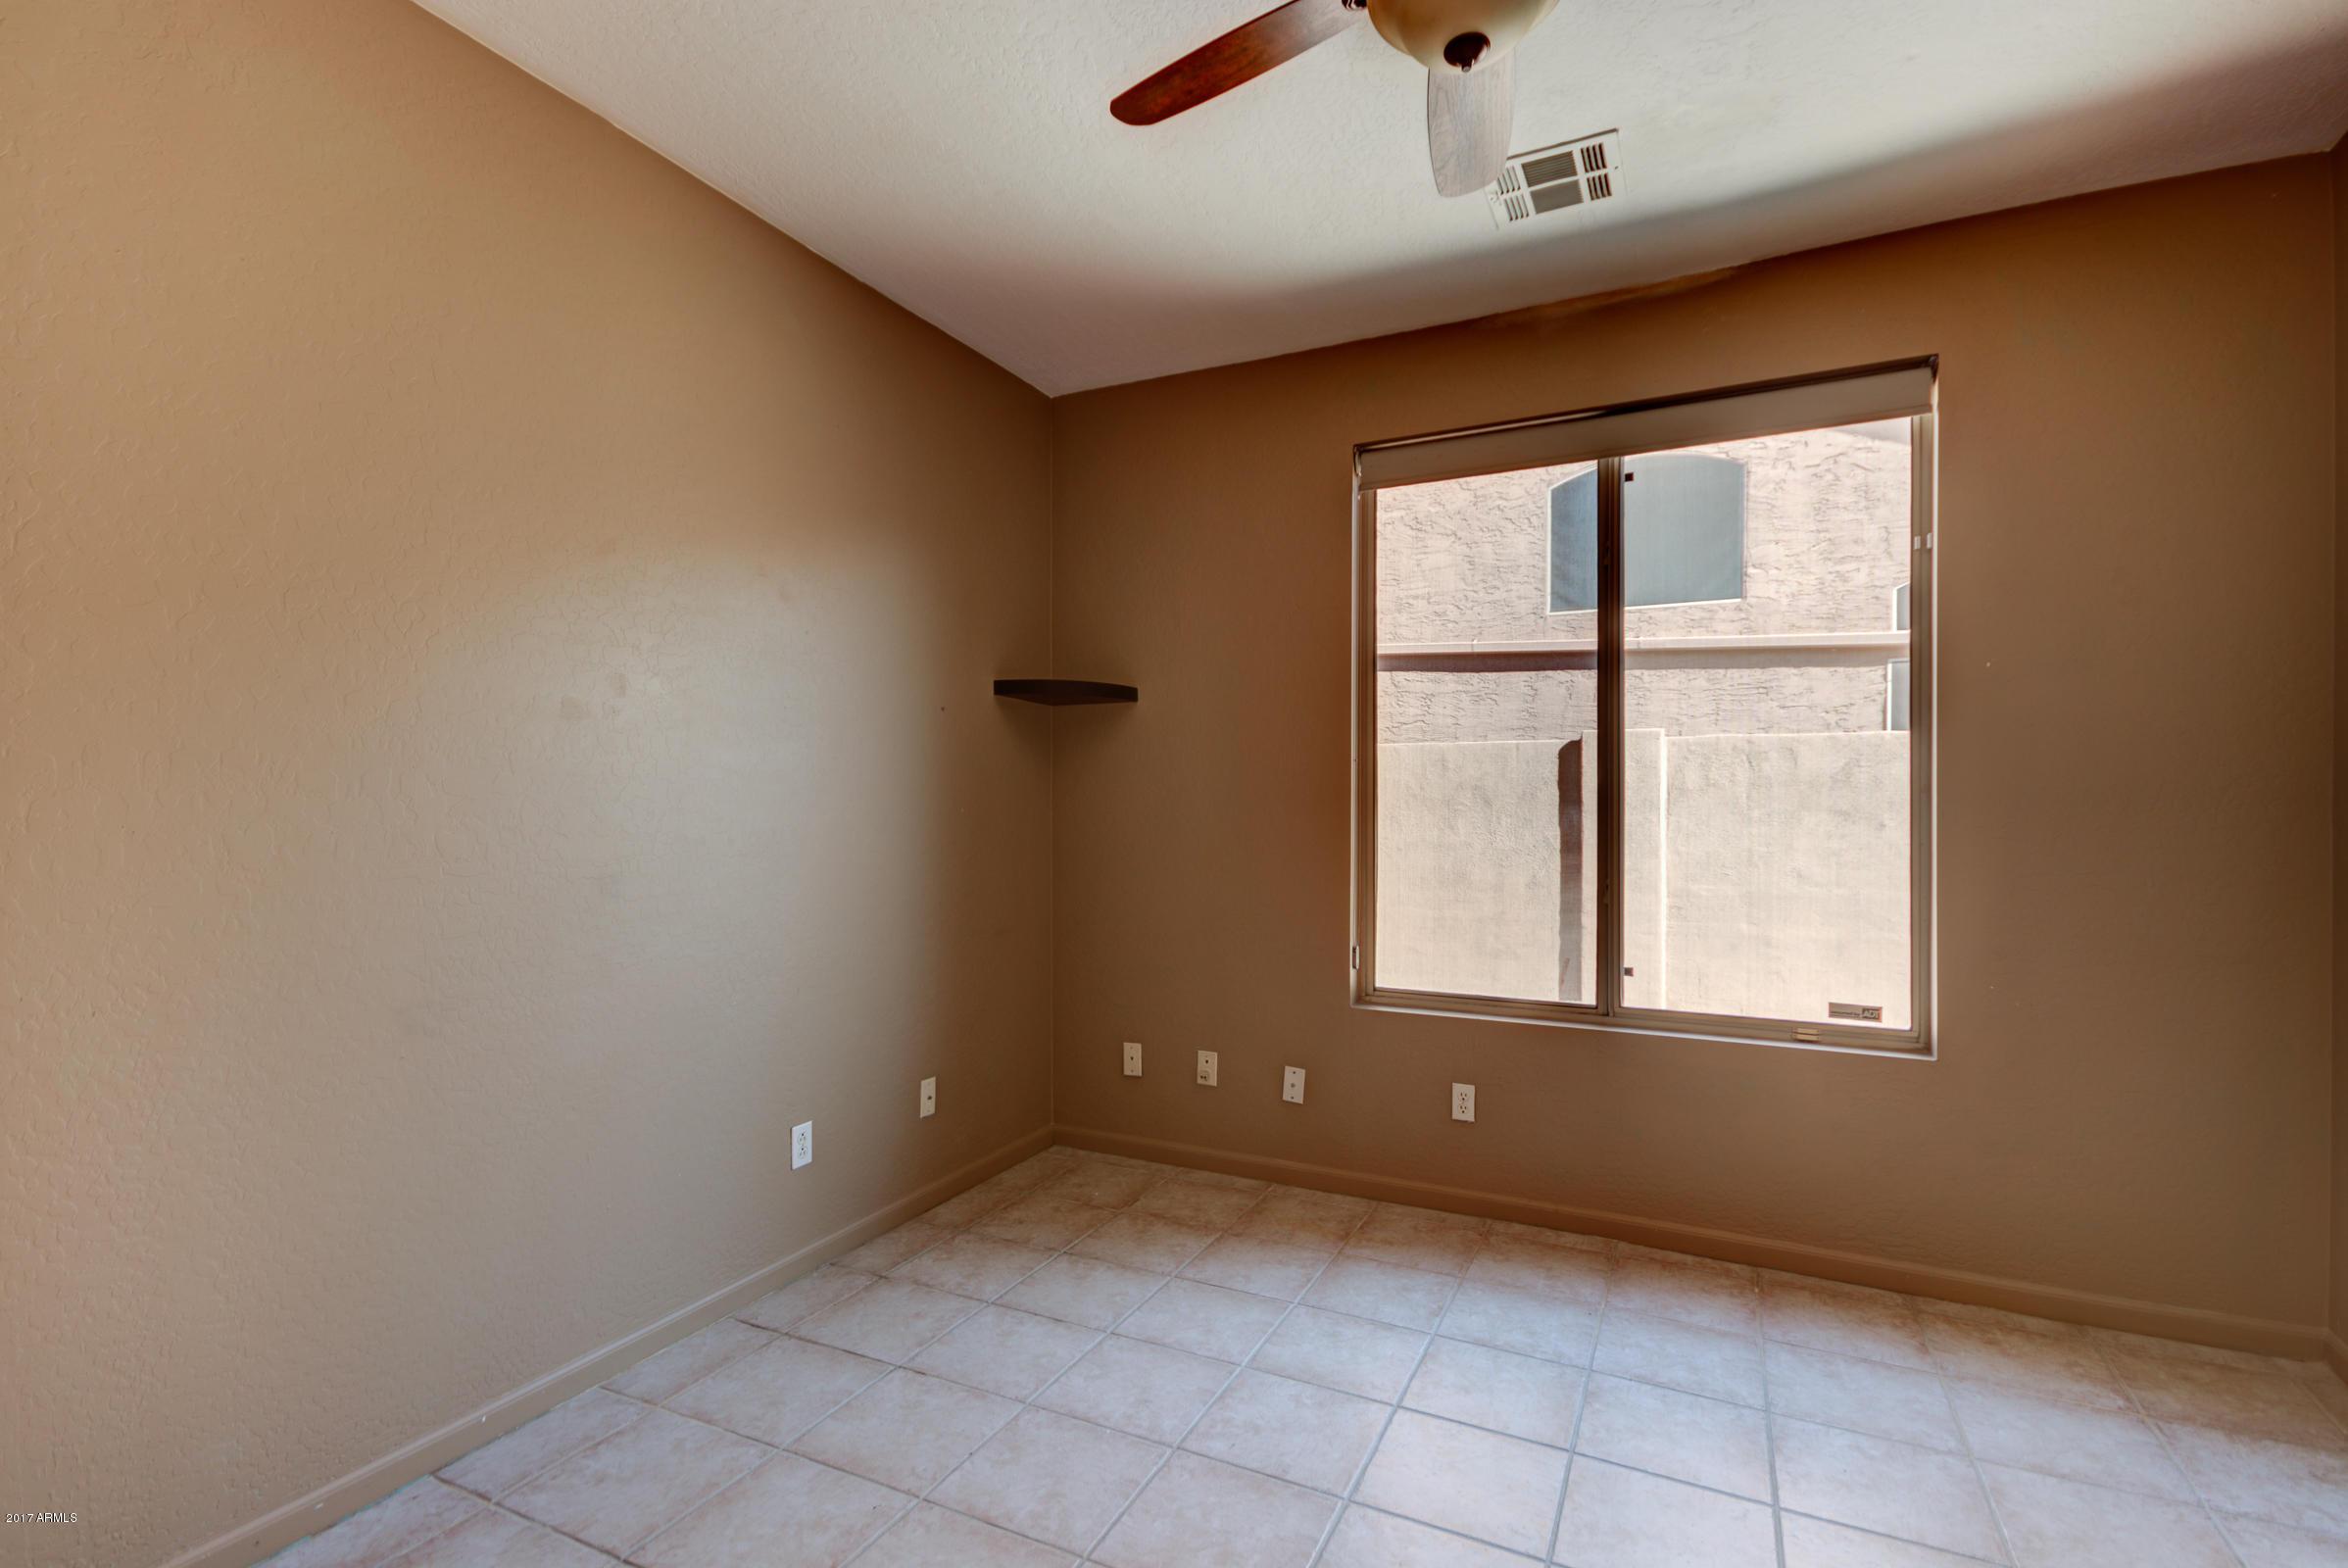 304 S Ironwood  Street Gilbert, AZ 85296 - img24